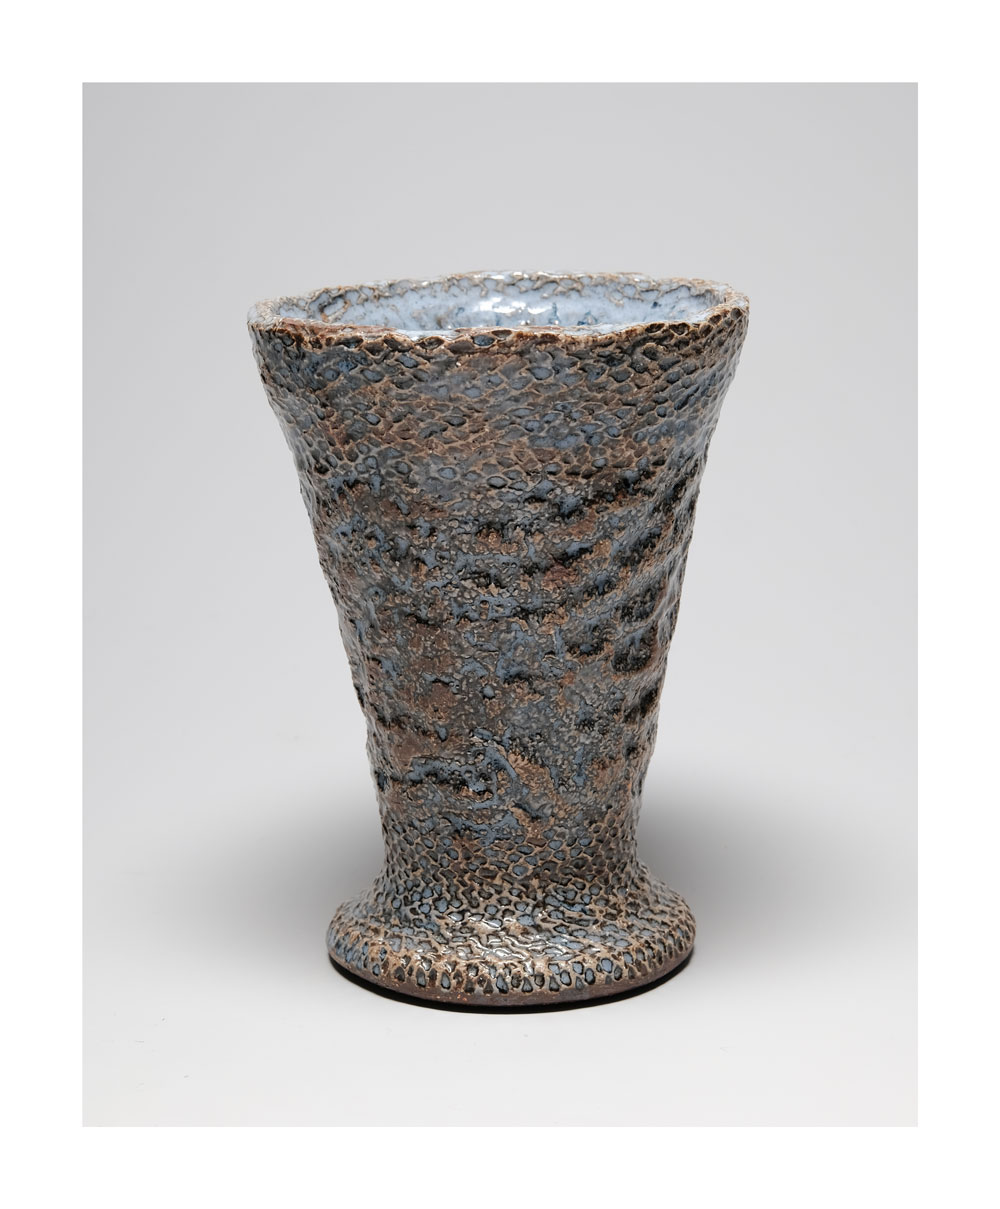 Goosefoot ceramics